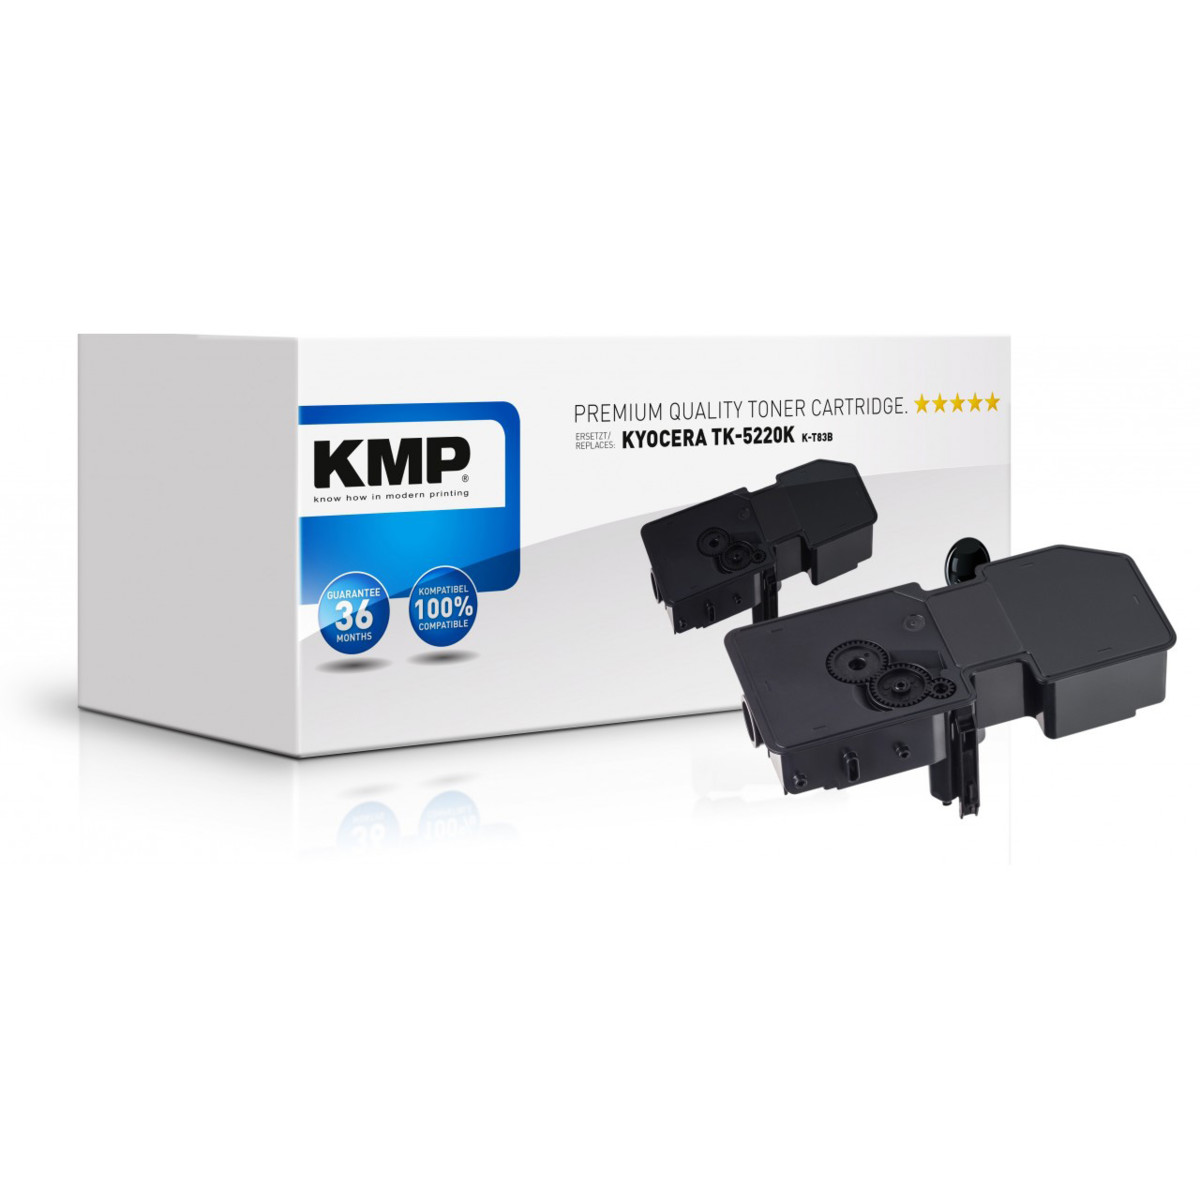 KMP Toner Kyocera TK-5230M, Kyocera 1T02R9BNL0, - kompatibilný s čipom (Purpurový)